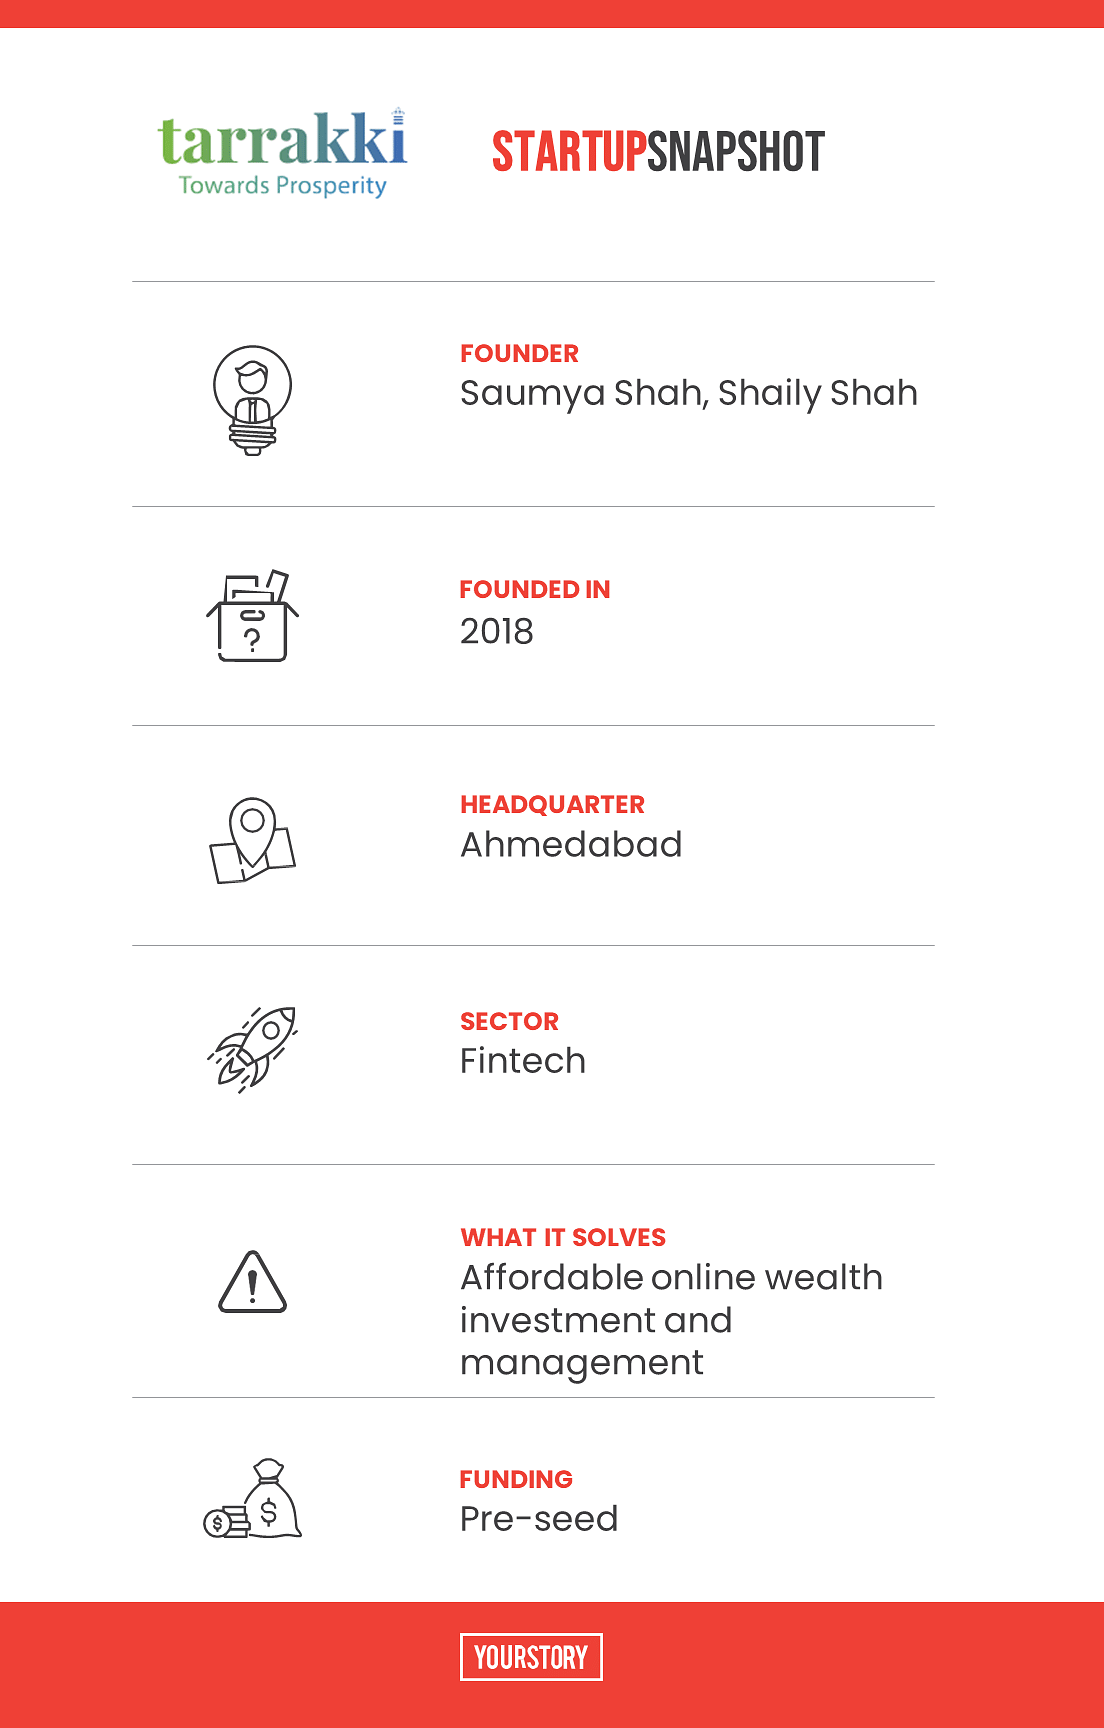 Tarrakki startup snapshot